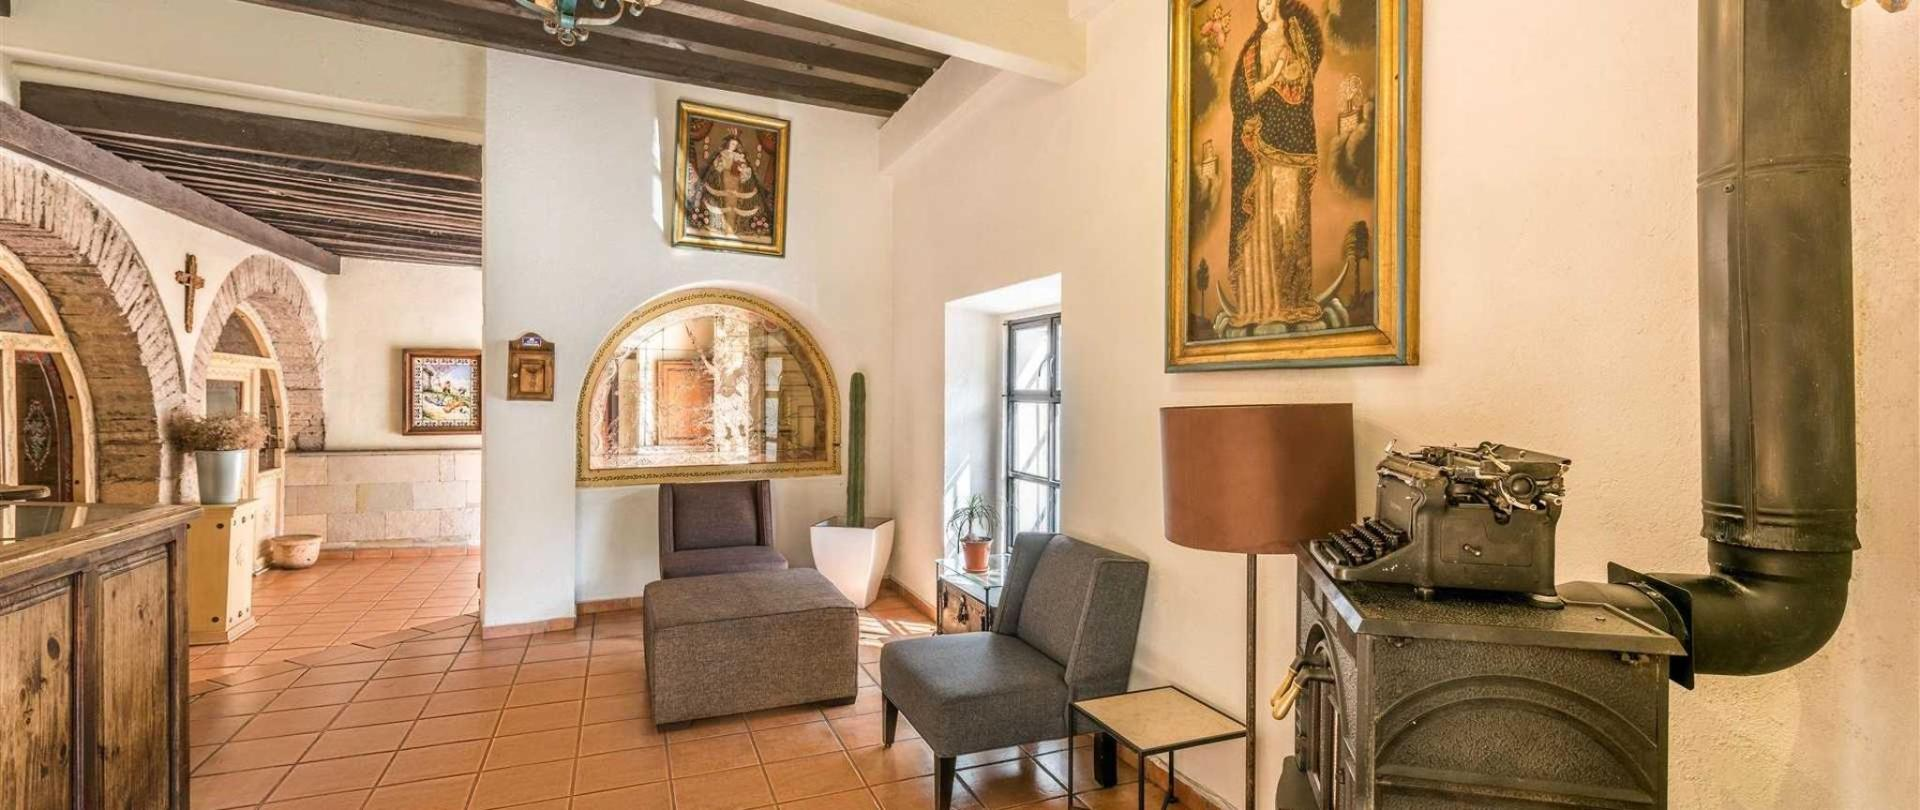 homepage-la-abadia-hotel-guanajuato-mexico3.jpeg